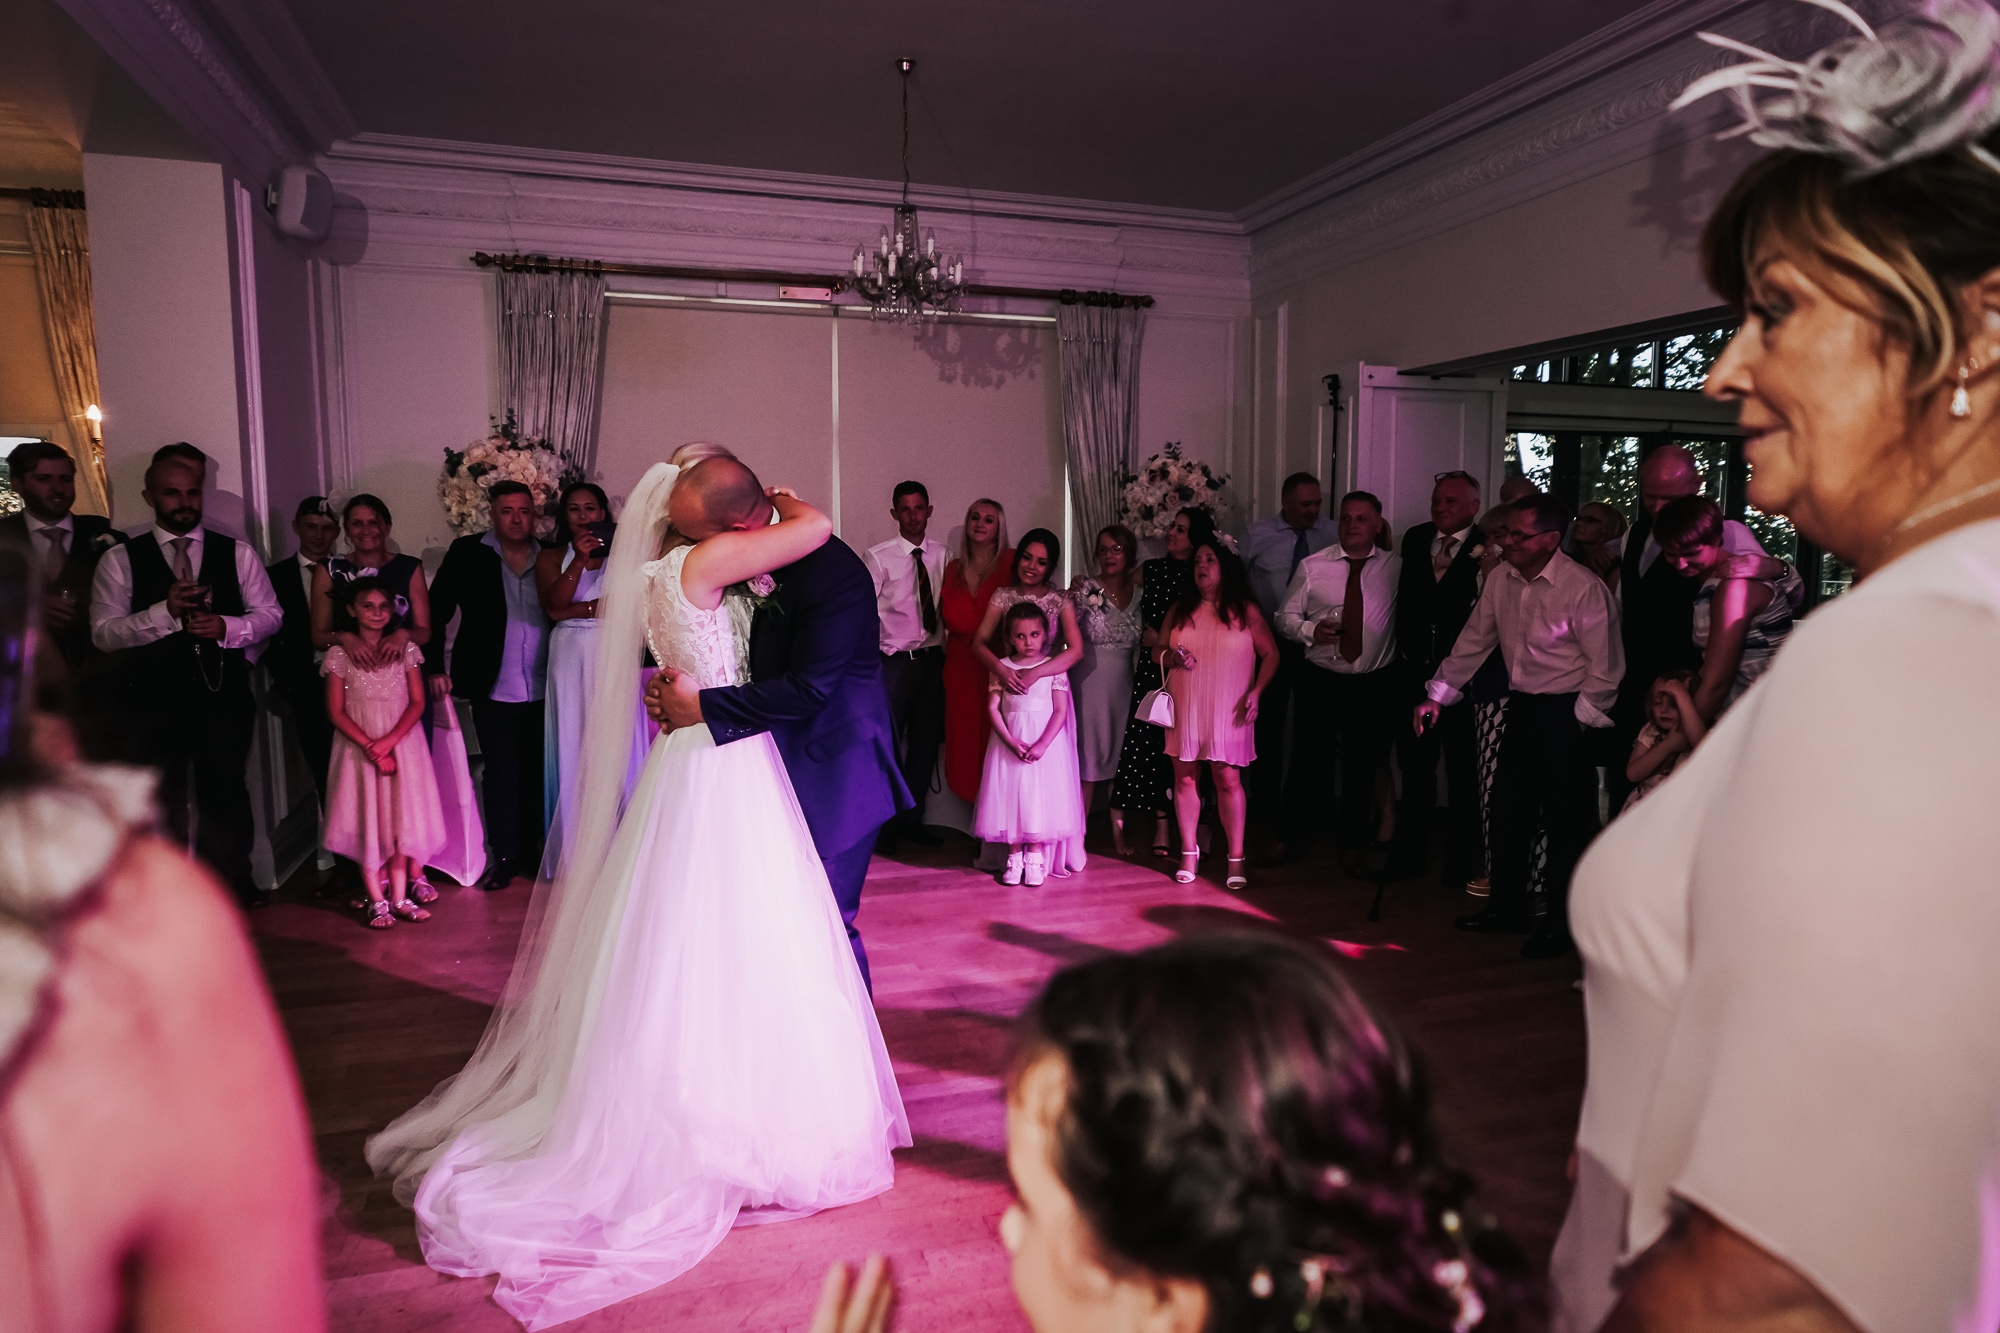 West Tower Wedding Photographer Ormskirk Lancashire wedding photography (54 of 57).jpg